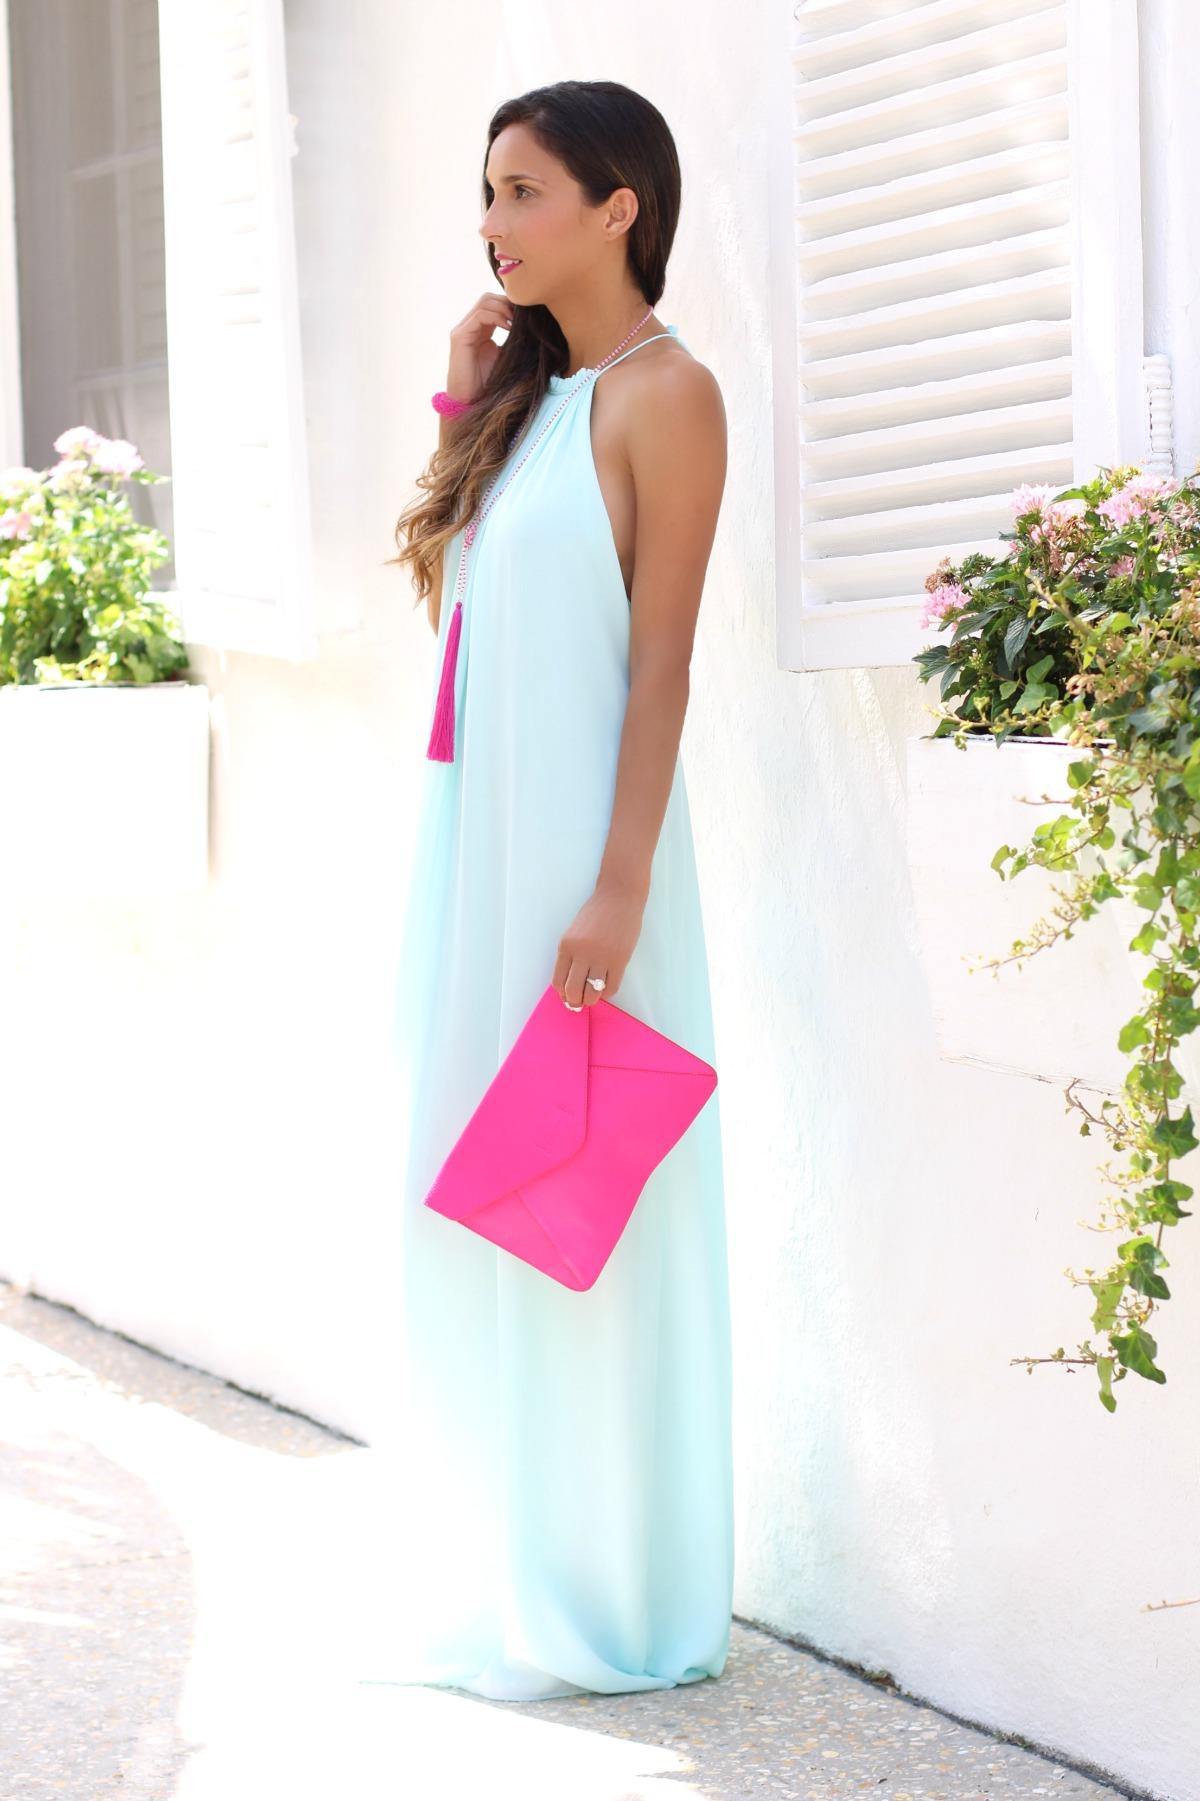 Mint maxi dress with fuchsia accessories